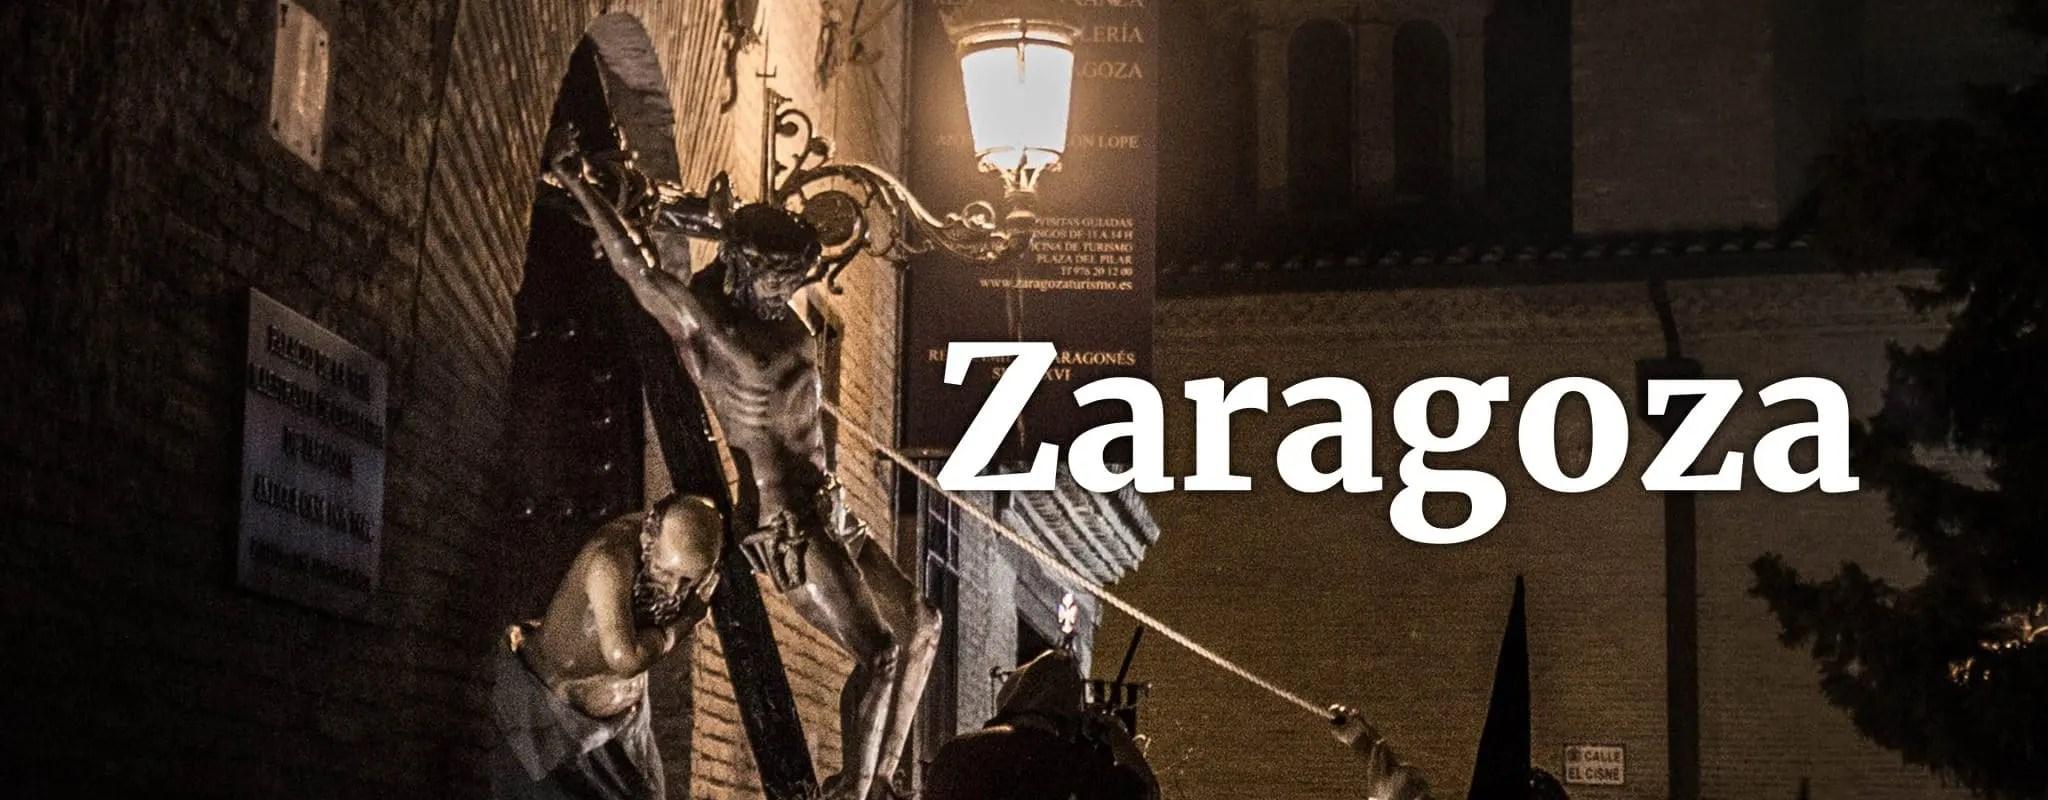 Zaragoza (portada inicio)